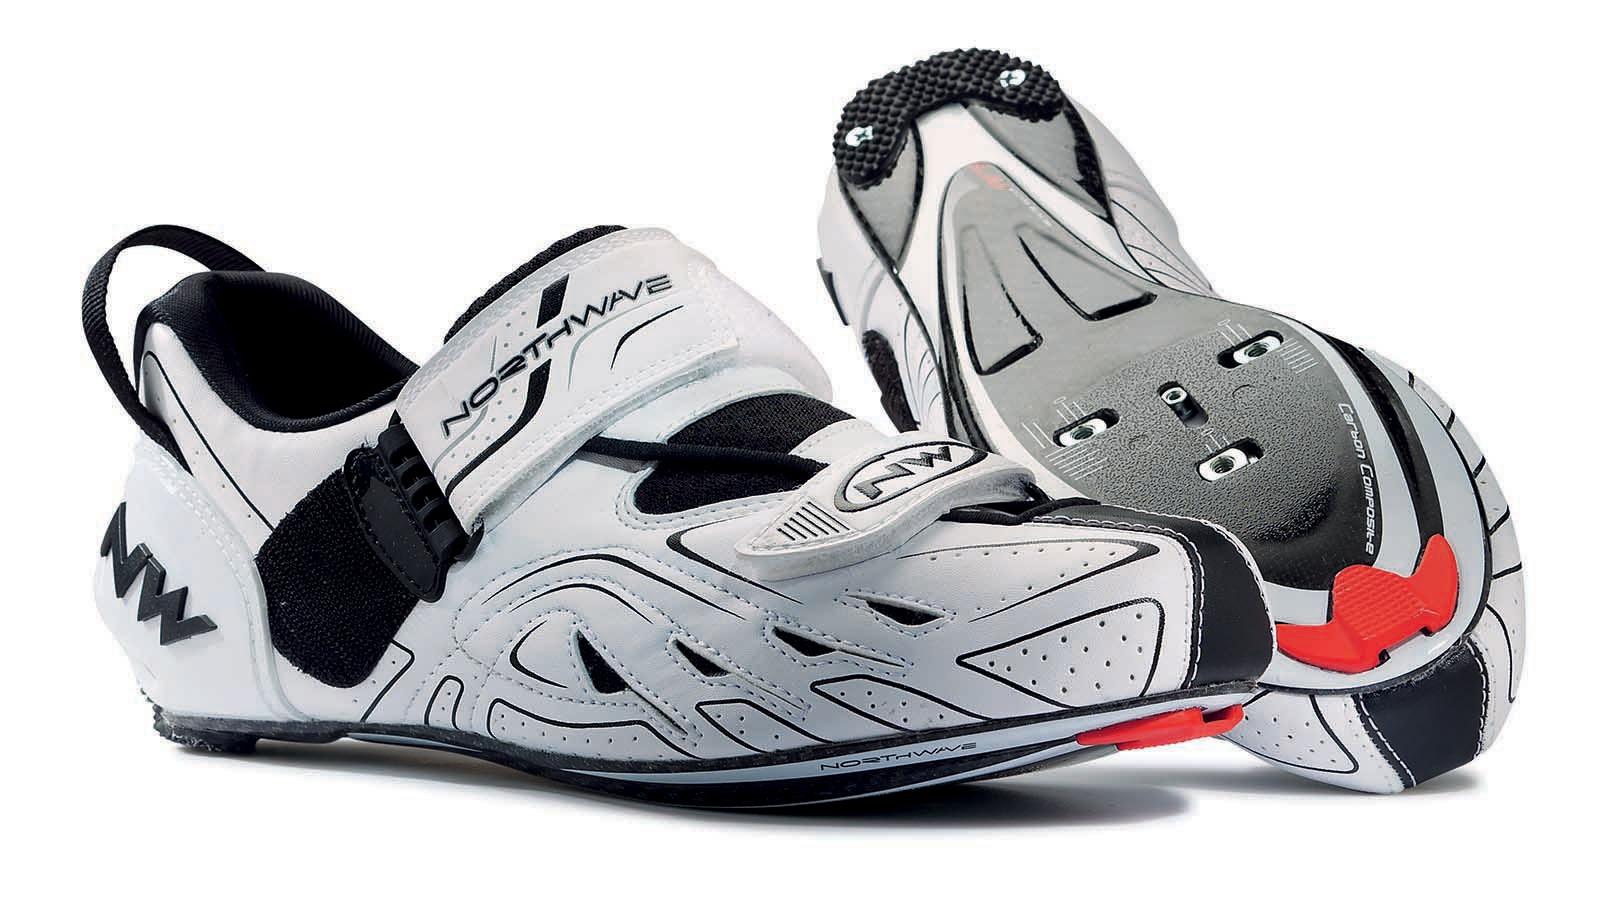 Buy Man Triathlon Shoes Tribute White 17619186   Italy2Us.com